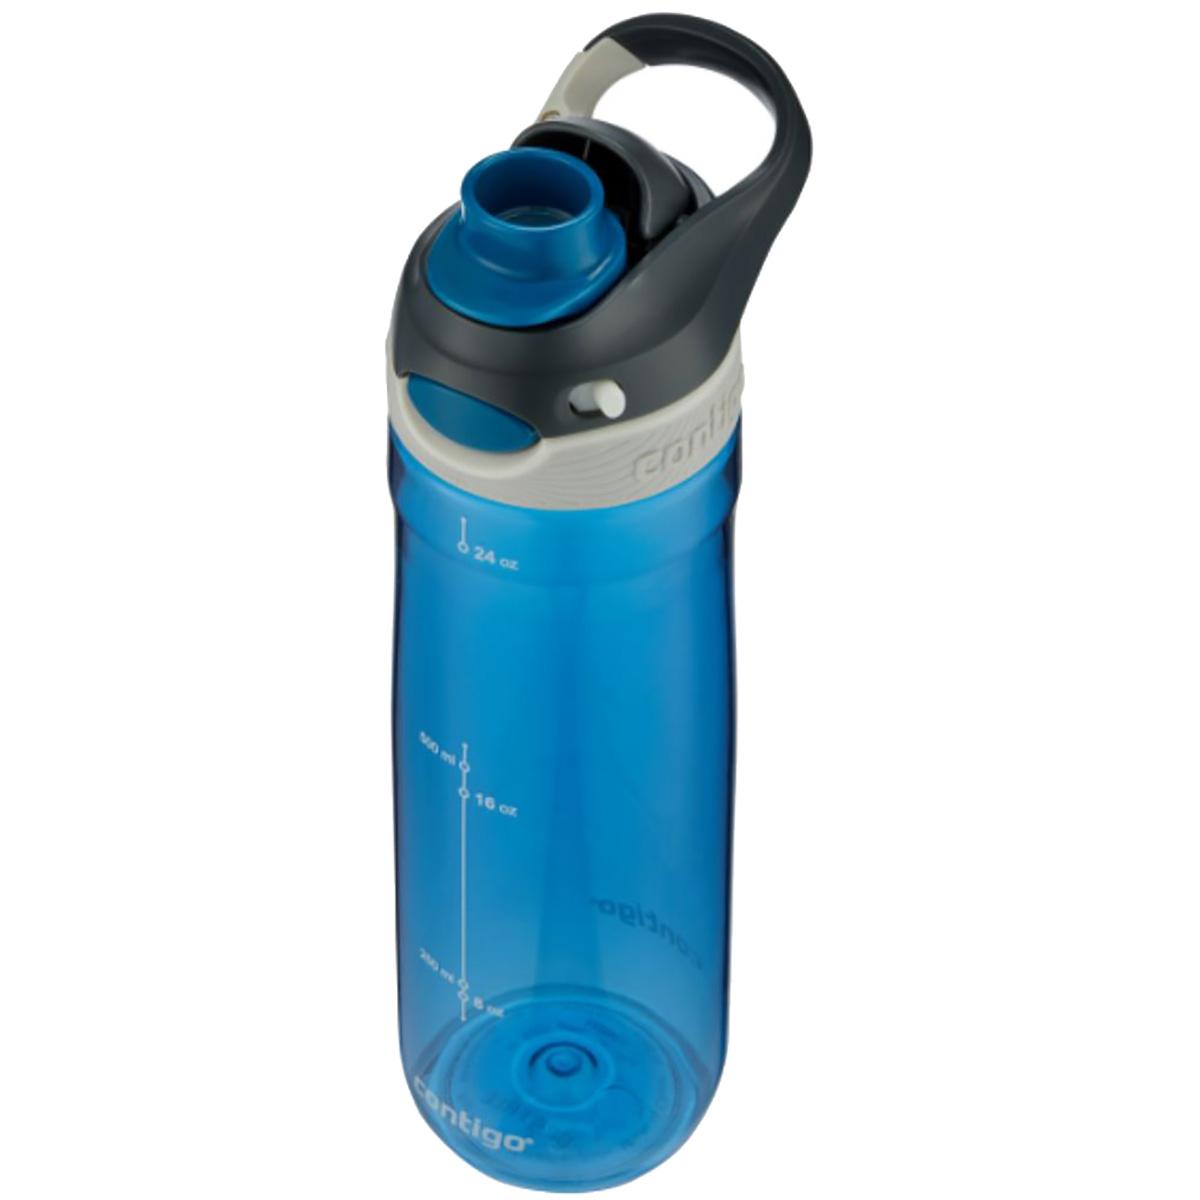 Contigo-24-oz-Chug-Autospout-Leak-Proof-Water-Bottle miniatuur 13